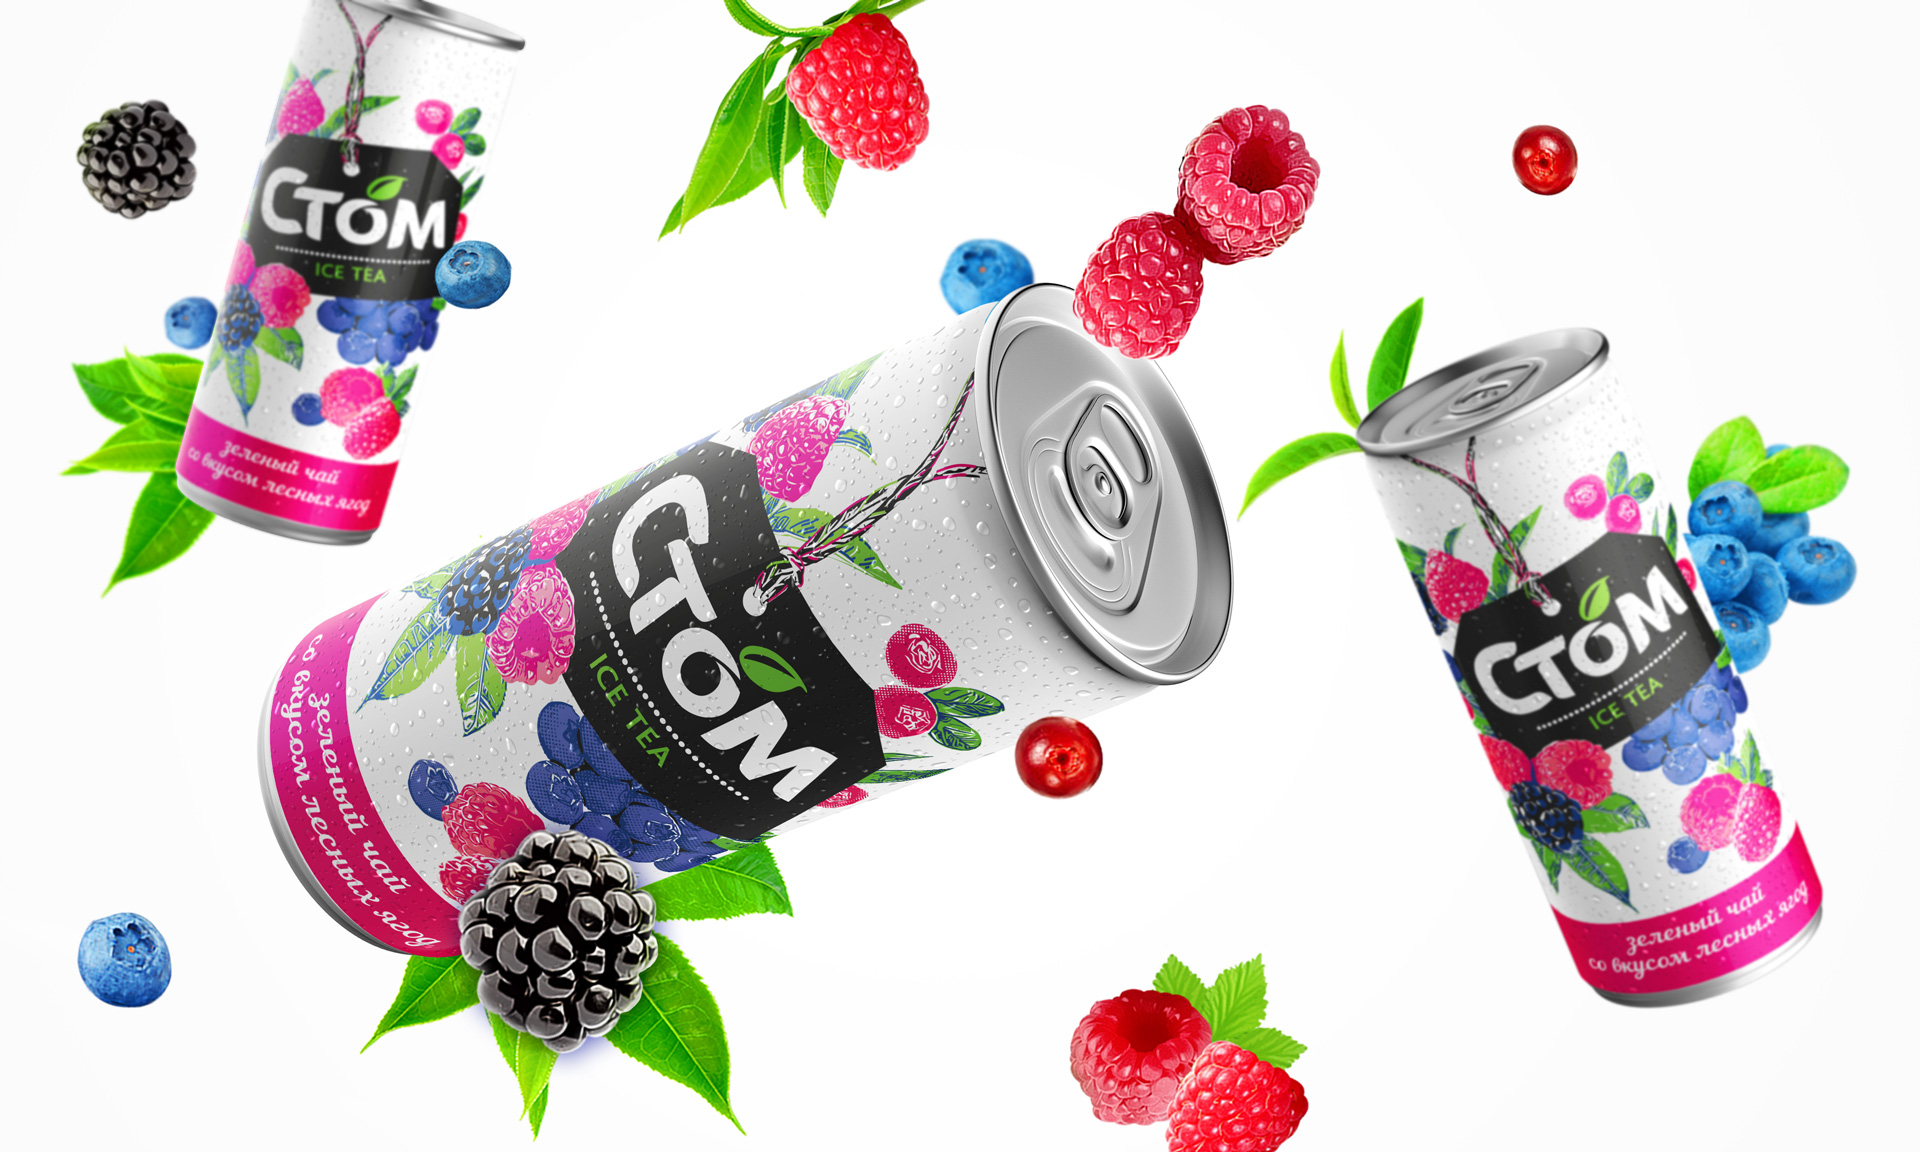 Ice tea design, packaging, can design, малина, ежевика, черника, raspberry, blackberry, blueberry, berries, лесные ягоды, чай